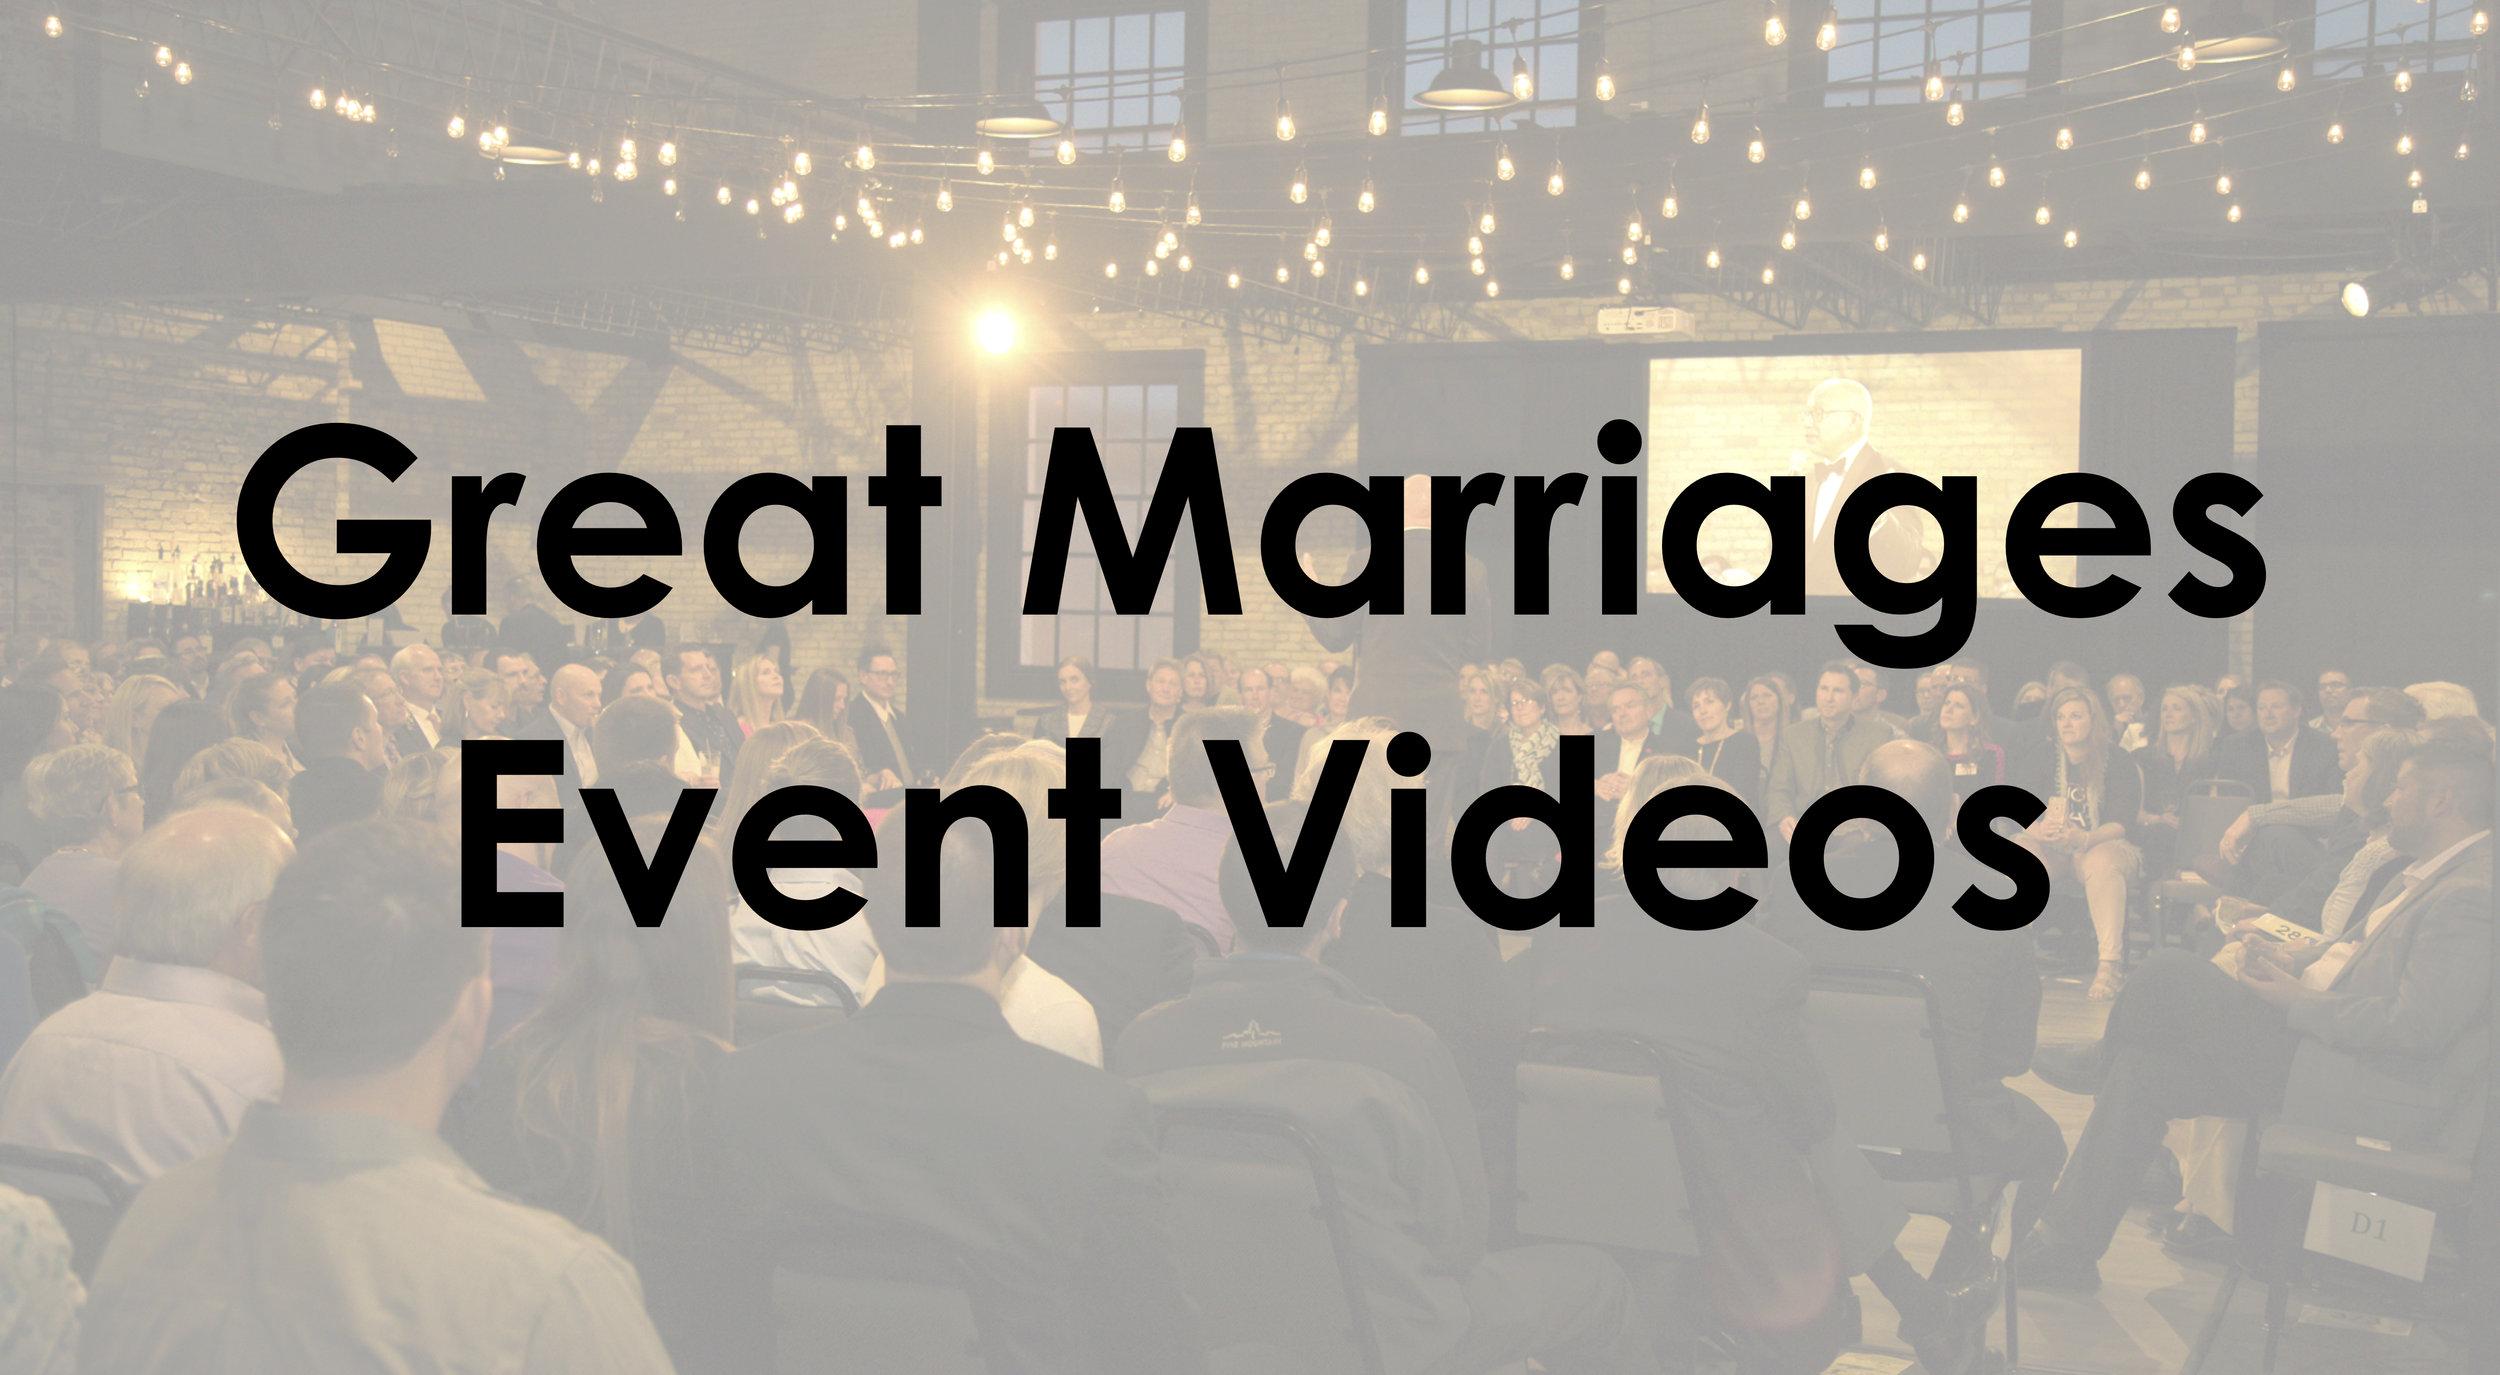 Events Videos.jpg